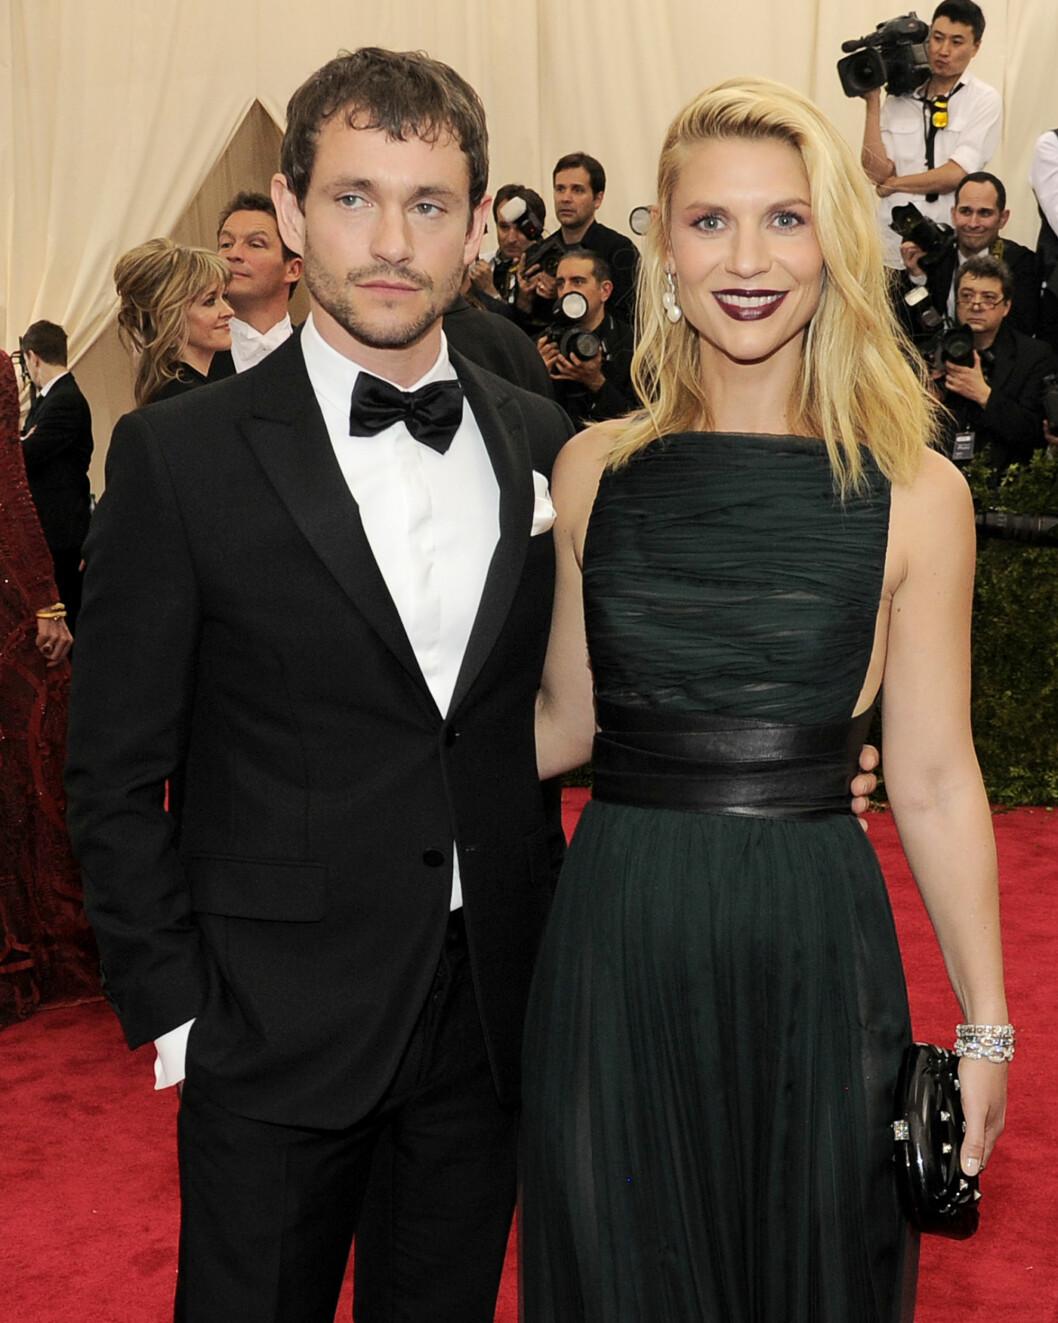 EKTEMANNEN: De ni siste årene har Claire Danes vært sammen med Hugh Dancy. De giftet seg i 2009. Her er paret på en premiere i mai i år.  Foto: SipaUSA